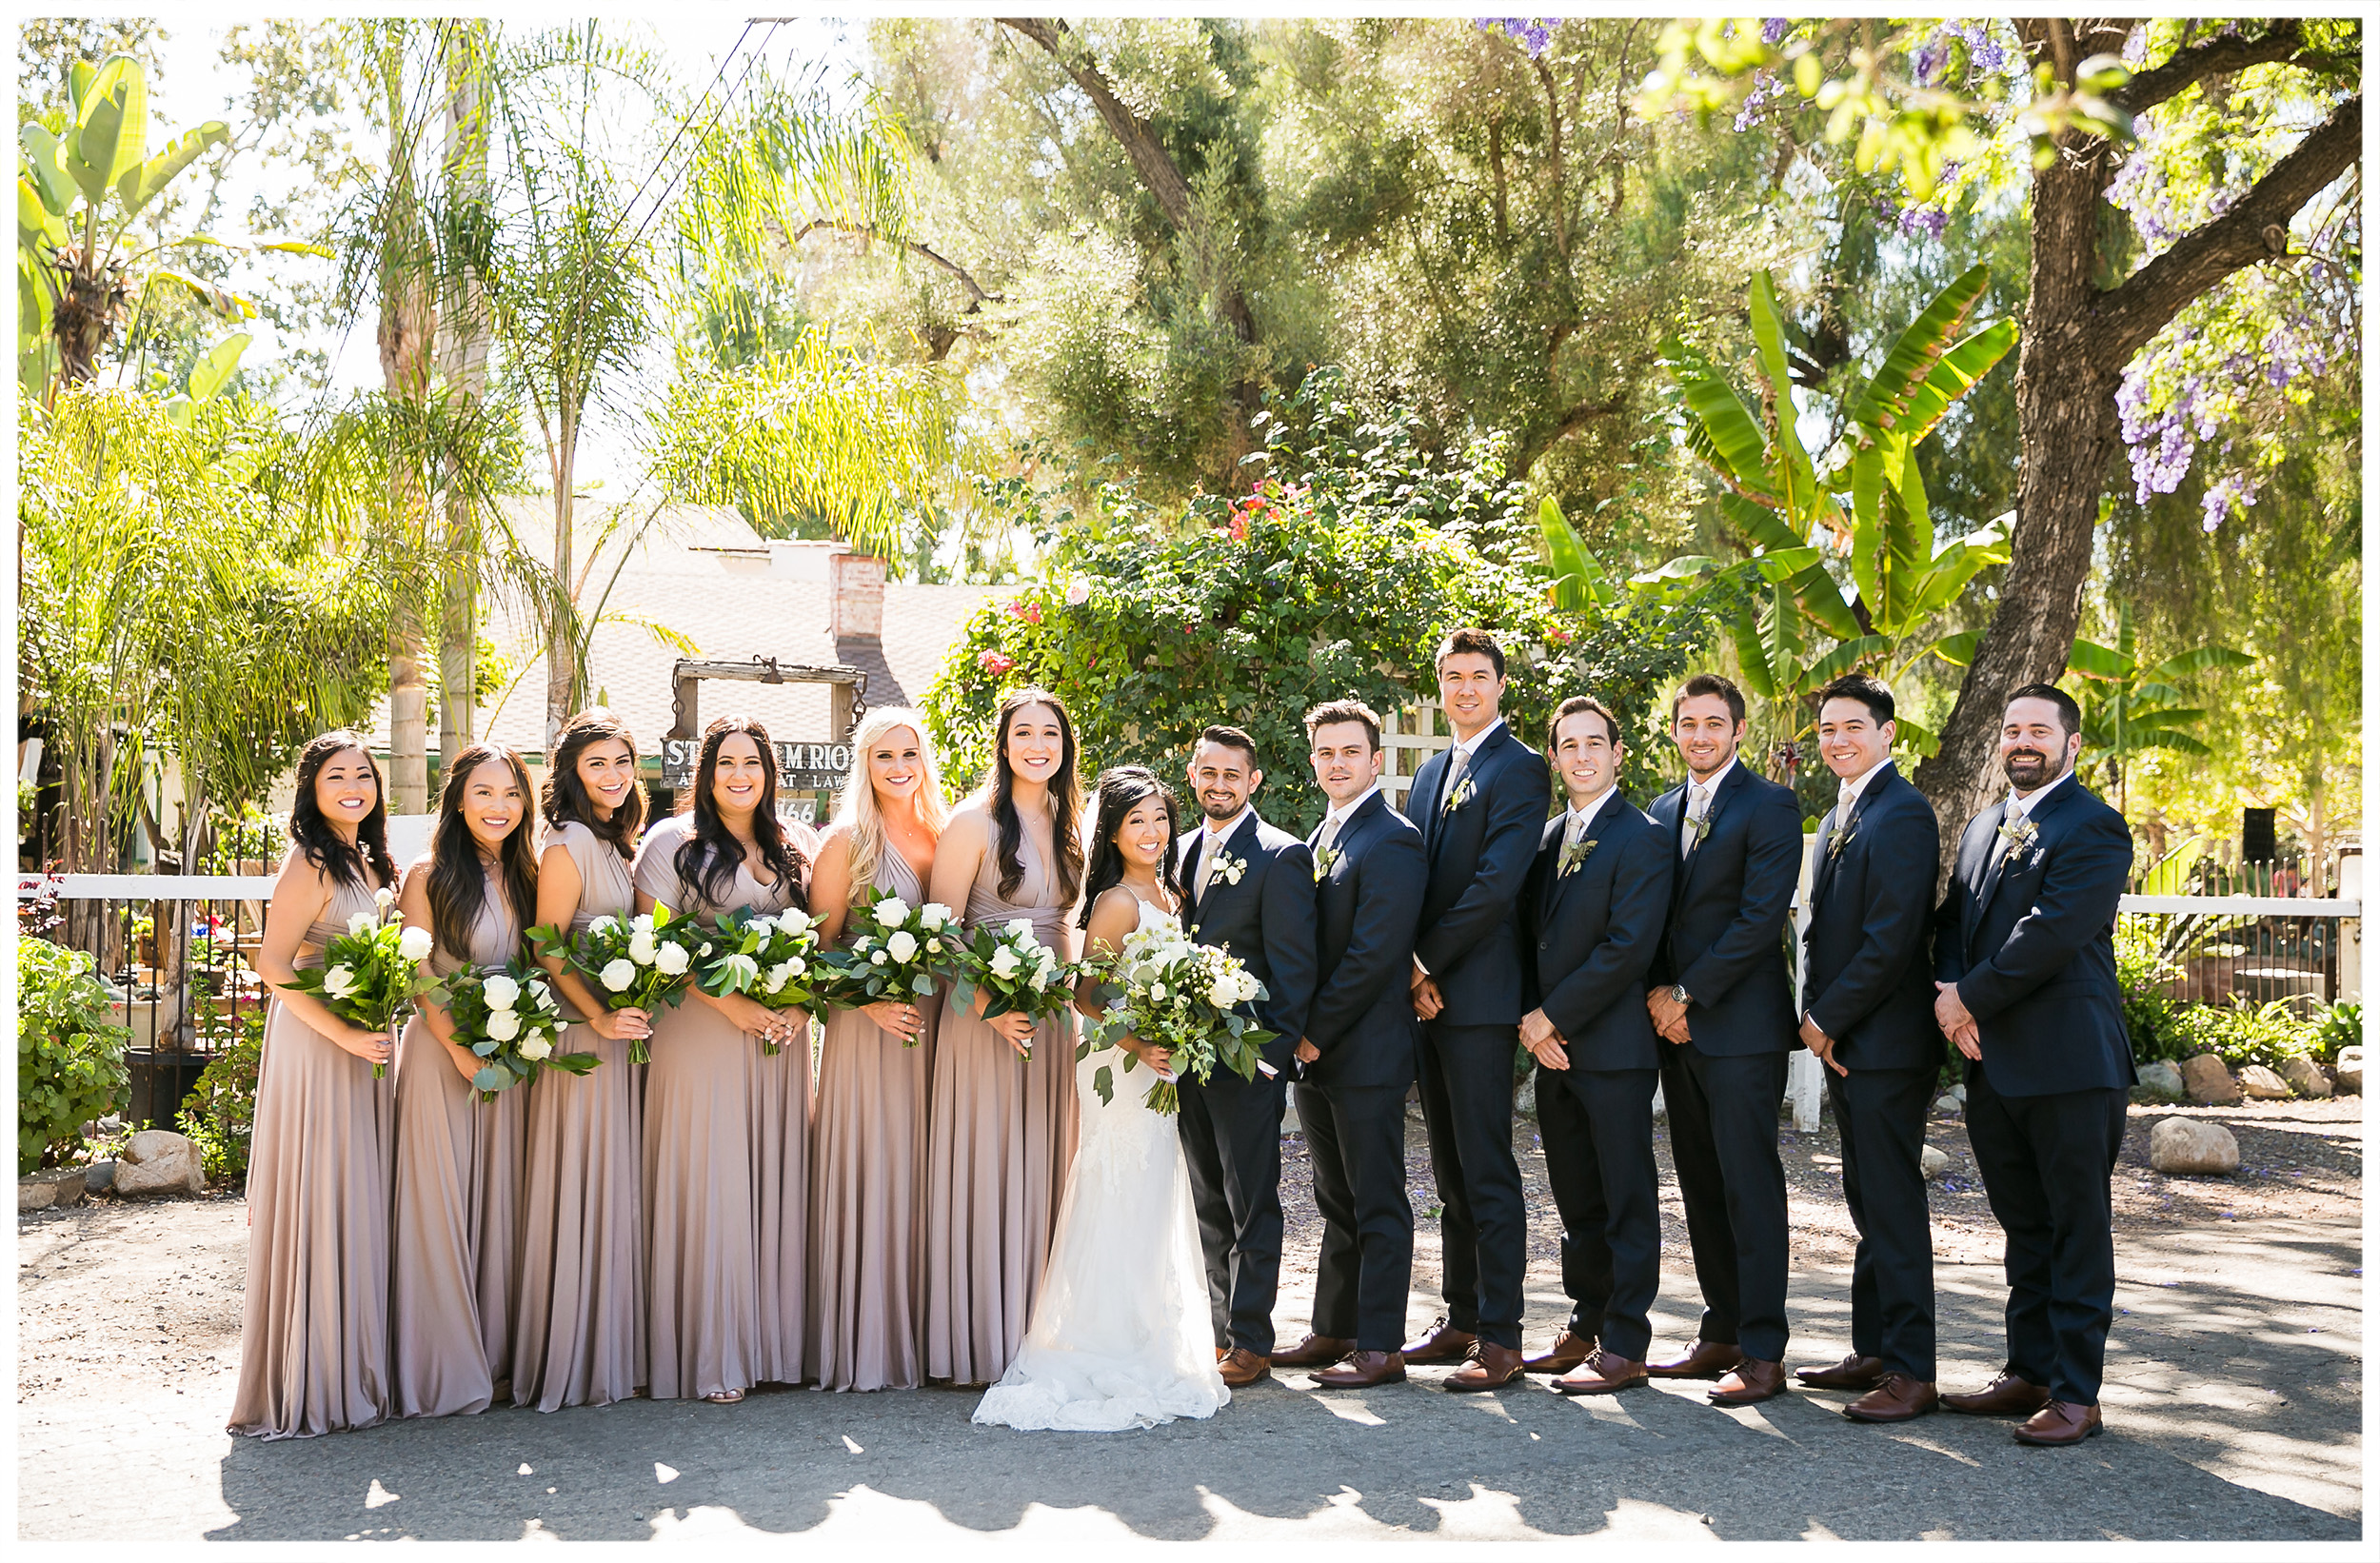 EC_Plaza-De-Magdalena-San-Juan-Capistrano-Wedding-Photography-33.jpg